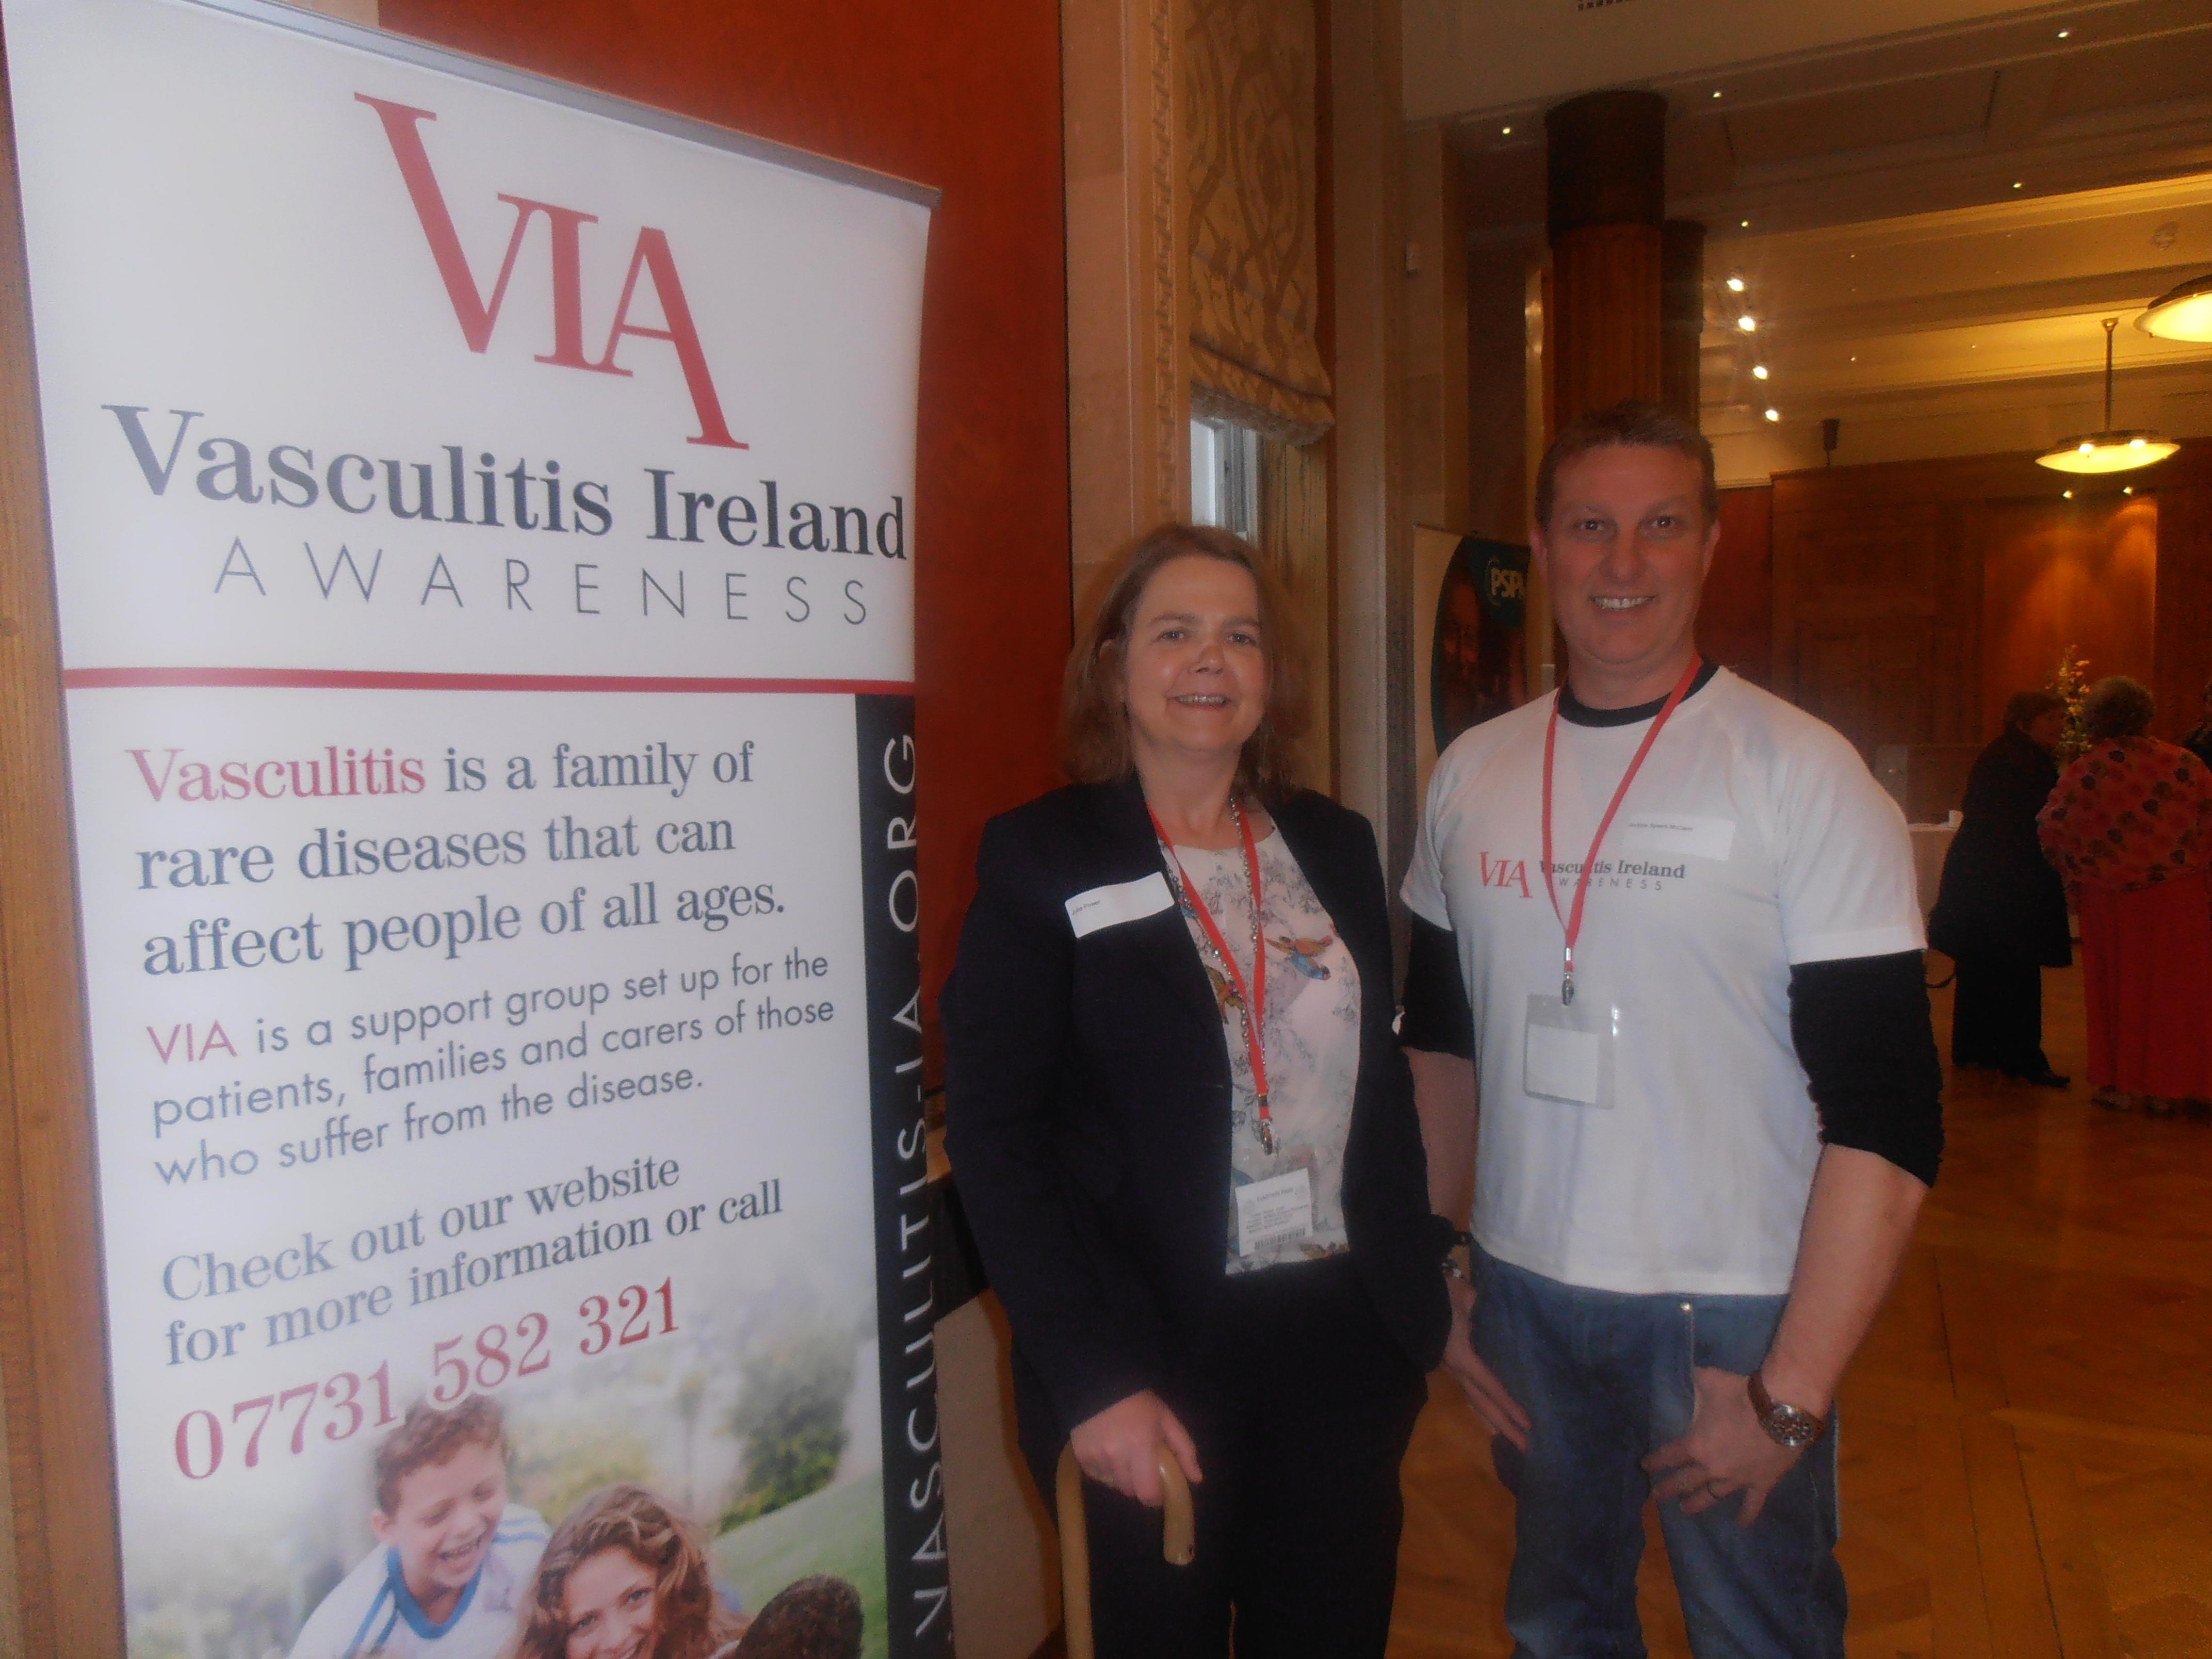 Andrew and Caroline from Vasculitis ireland